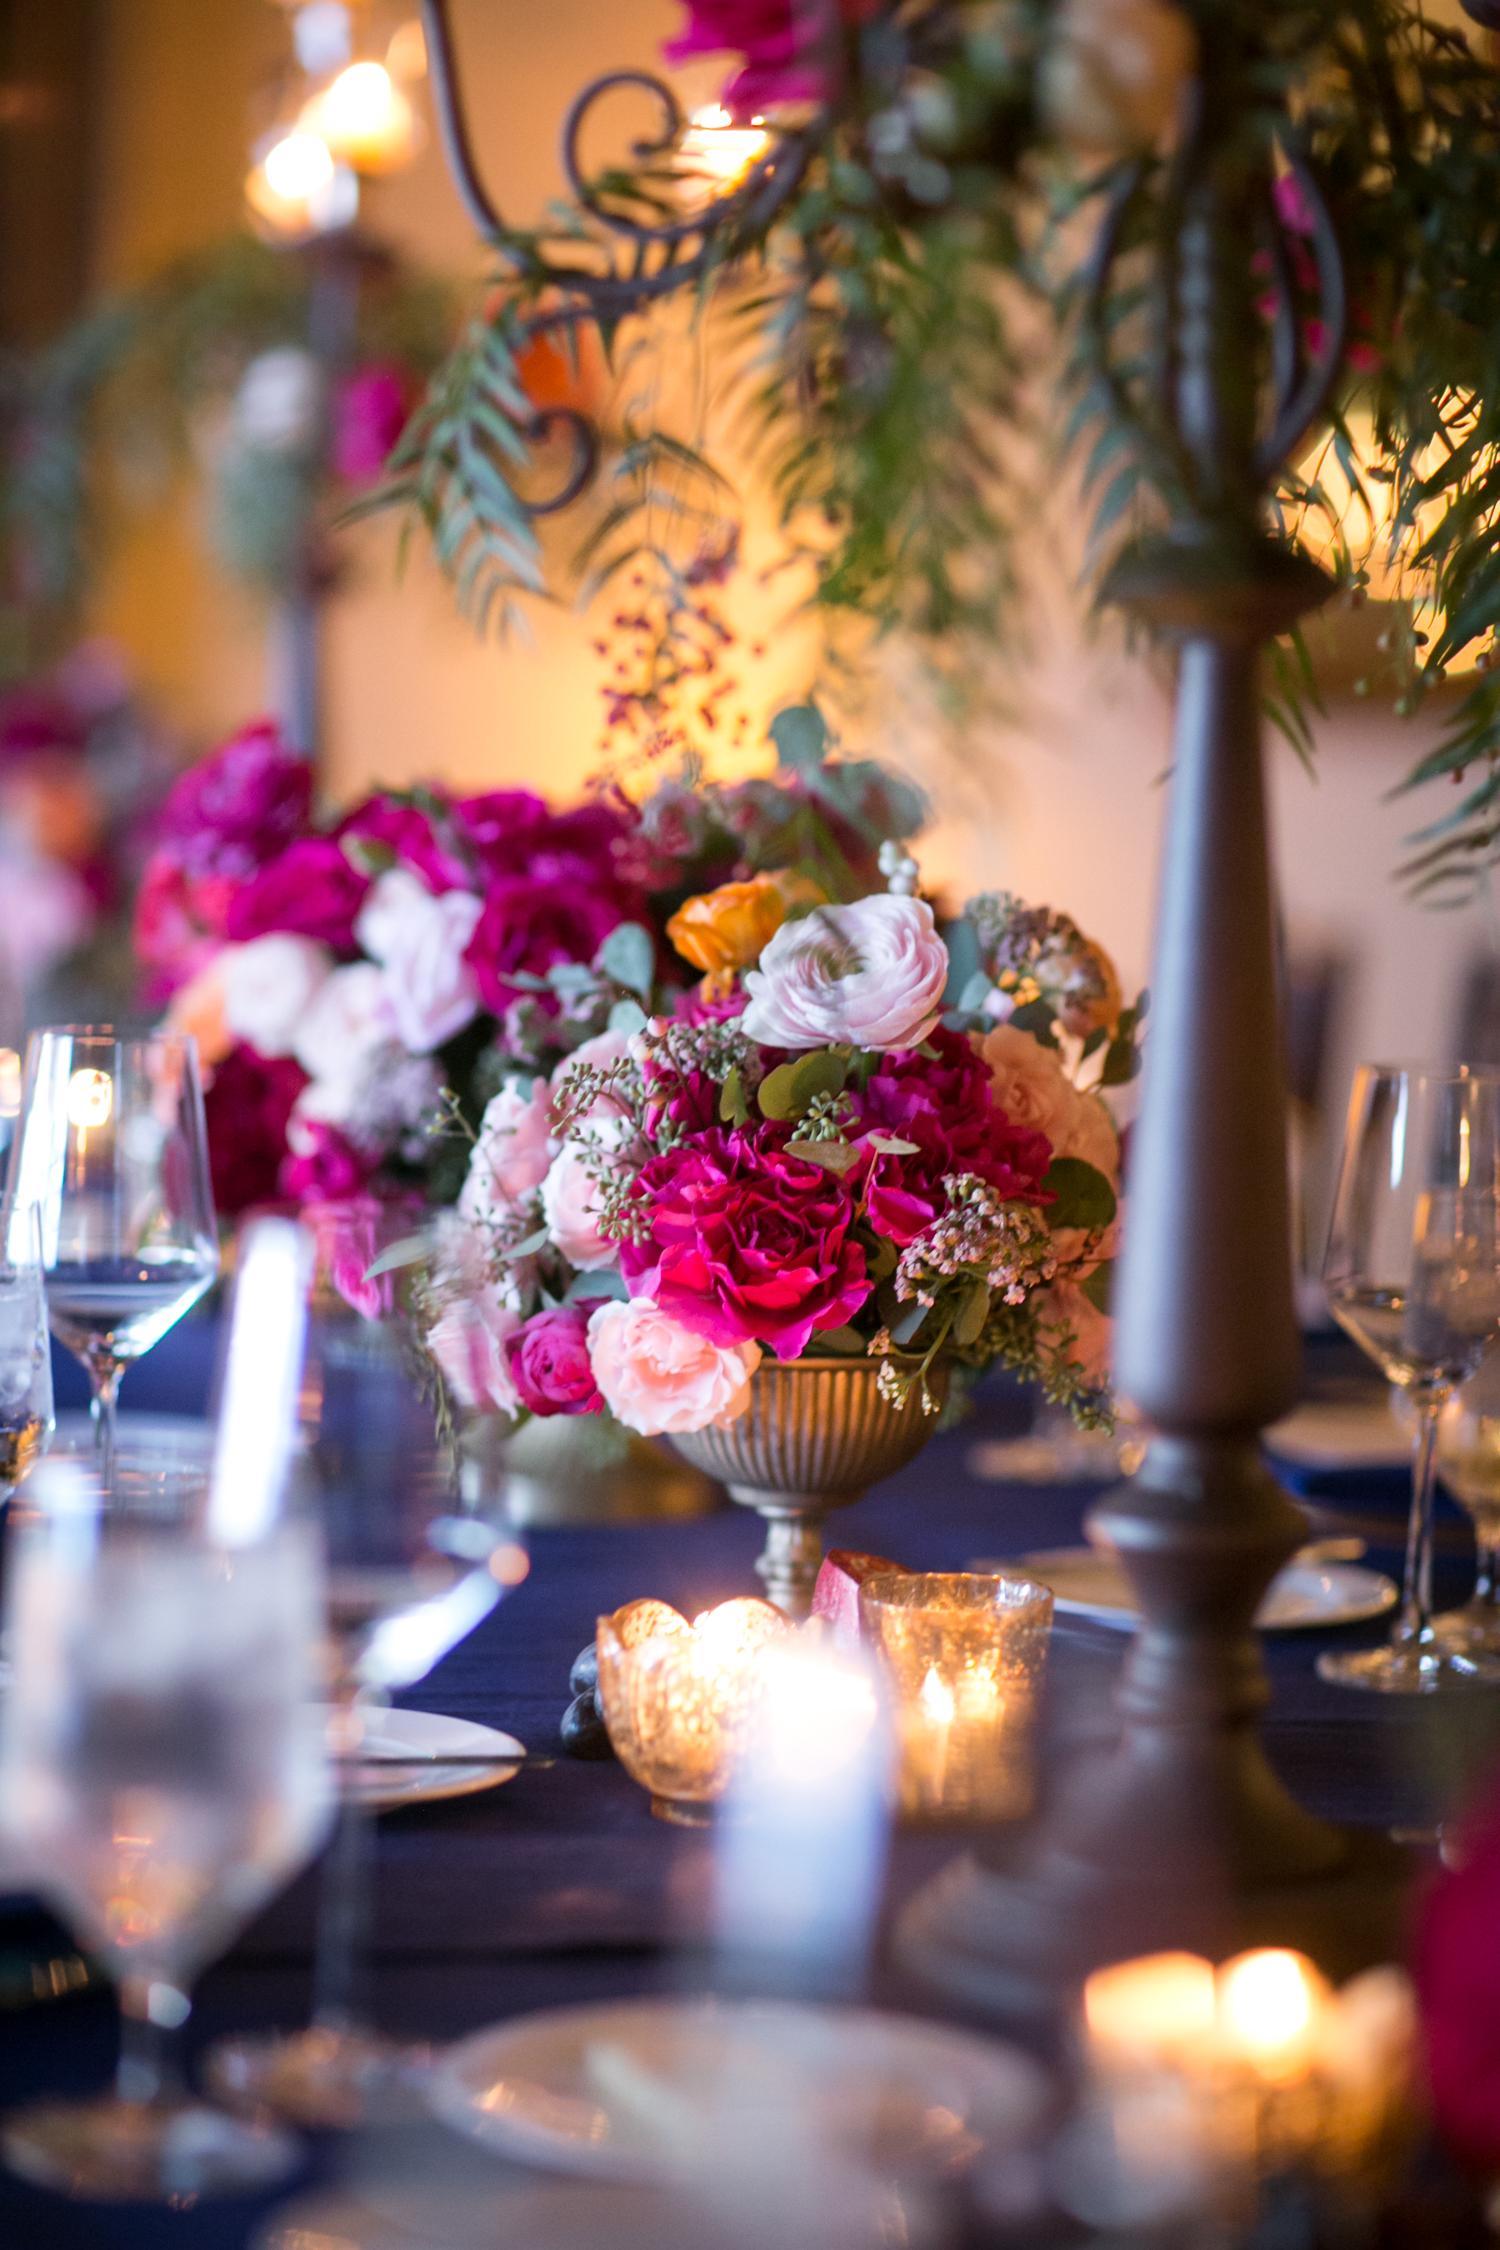 www.santabarbarawedding.com | Miki & Sonja Photography | Four Seasons Resort The Biltmore | Imagine Weddings & Special Events | La Tavola Linens | Rockrose Floral Design | Reception Tables